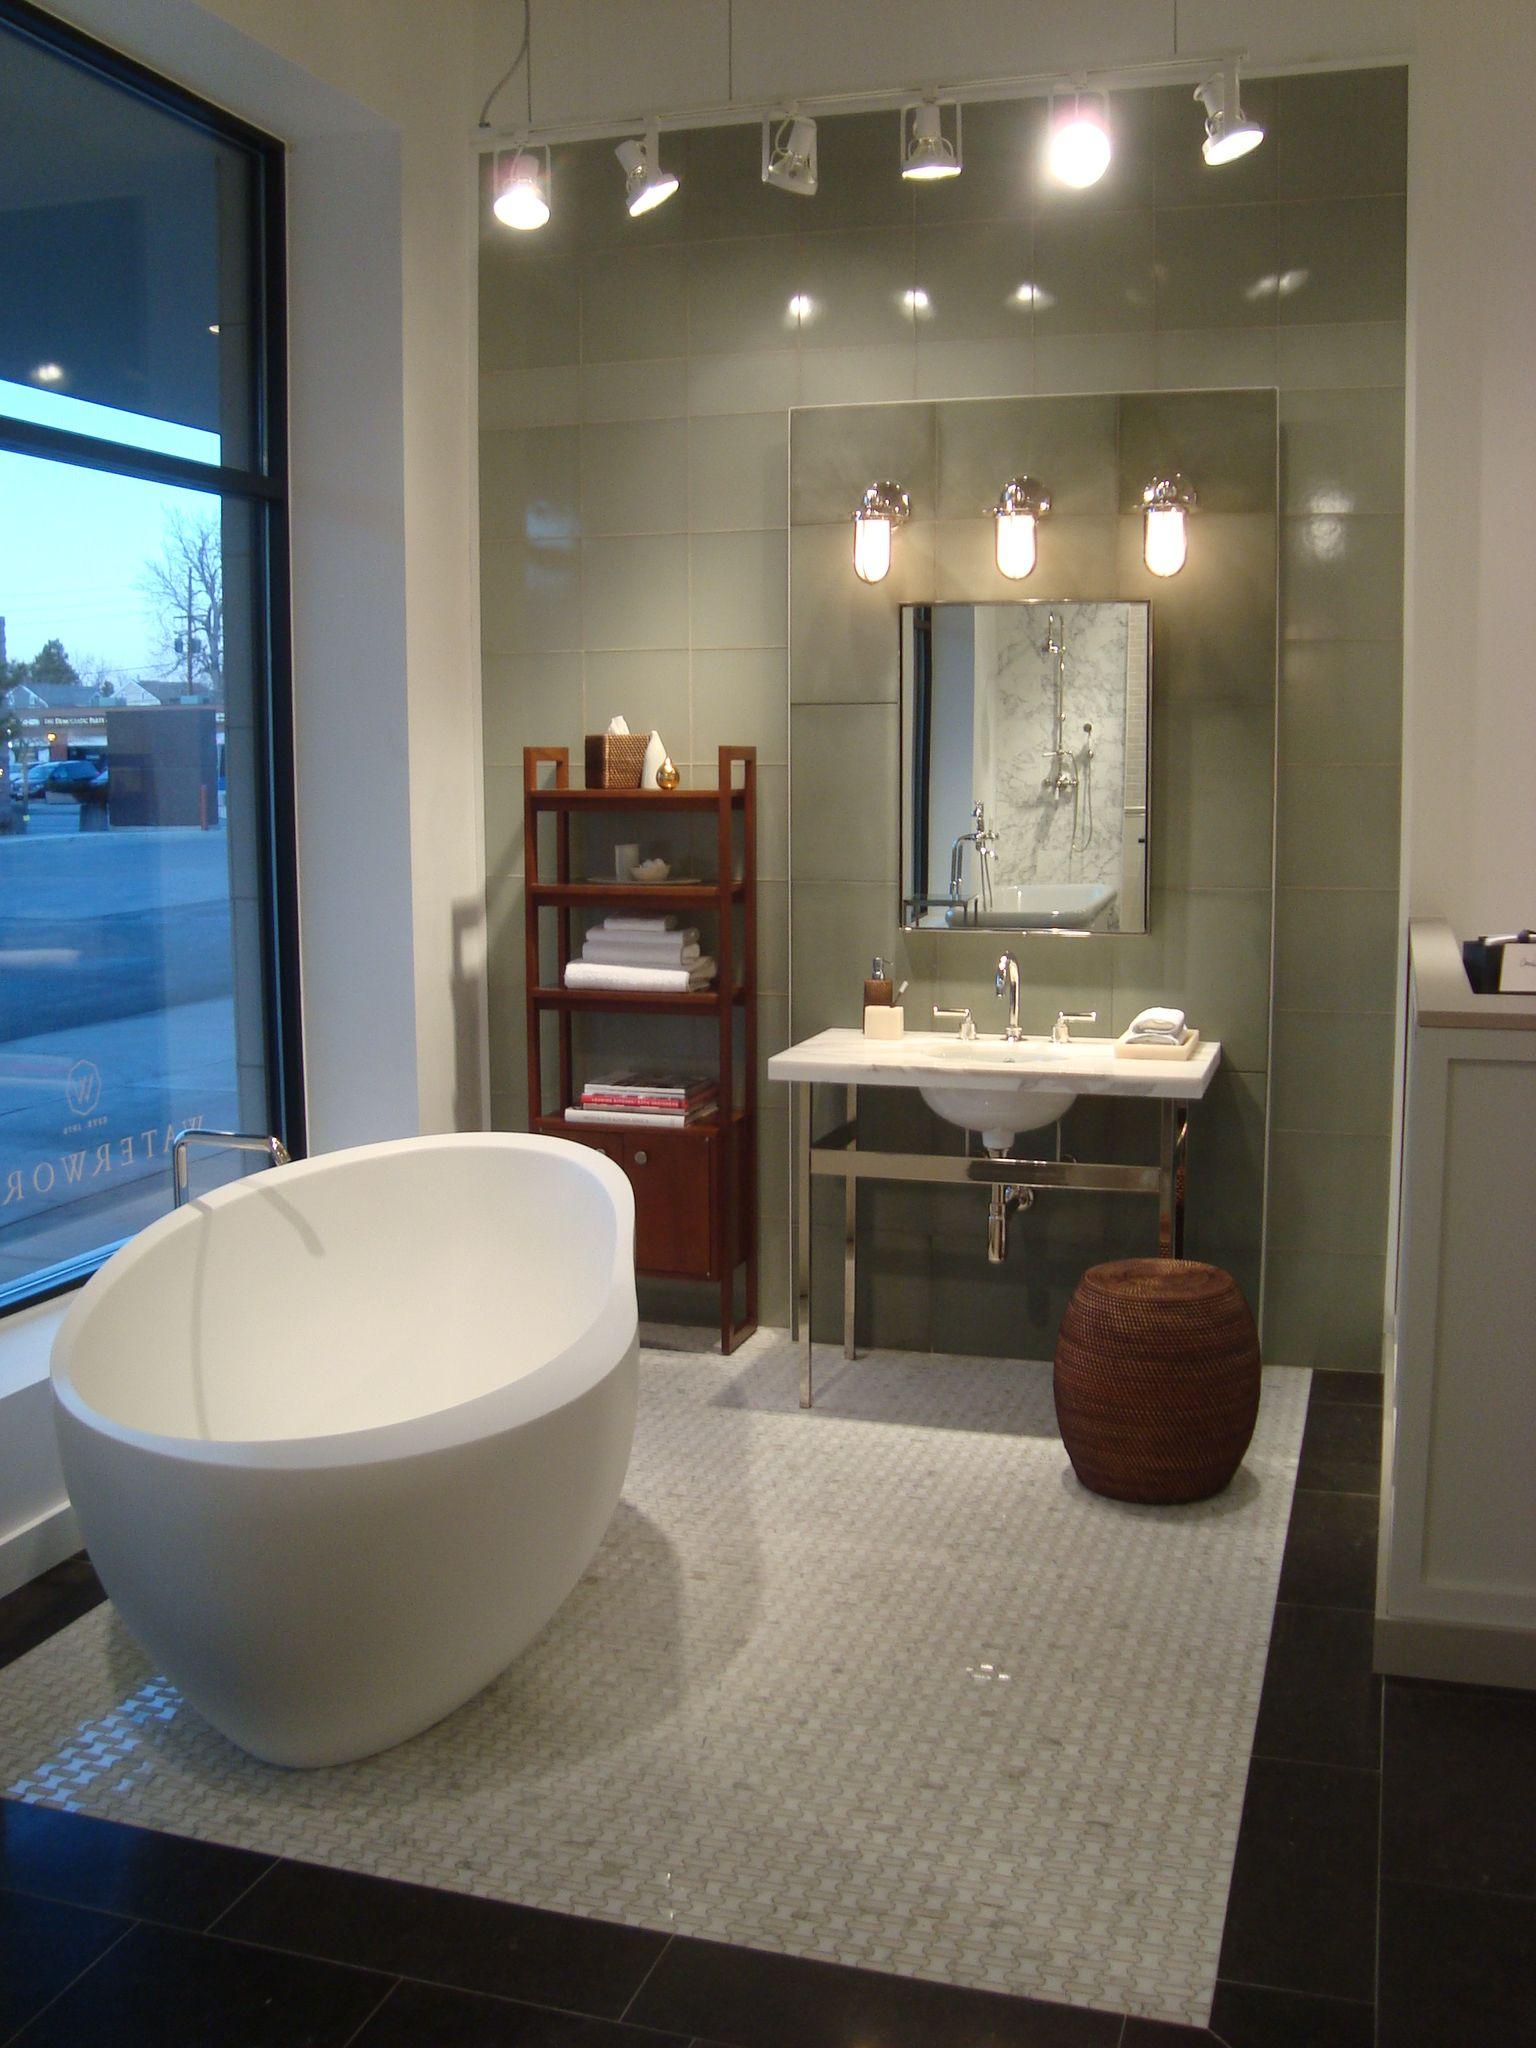 Pin By Devy On Showroom Bathwaree Design Small Apartment Bathroom Luxury Bathroom Master Baths Small Bathroom Remodel